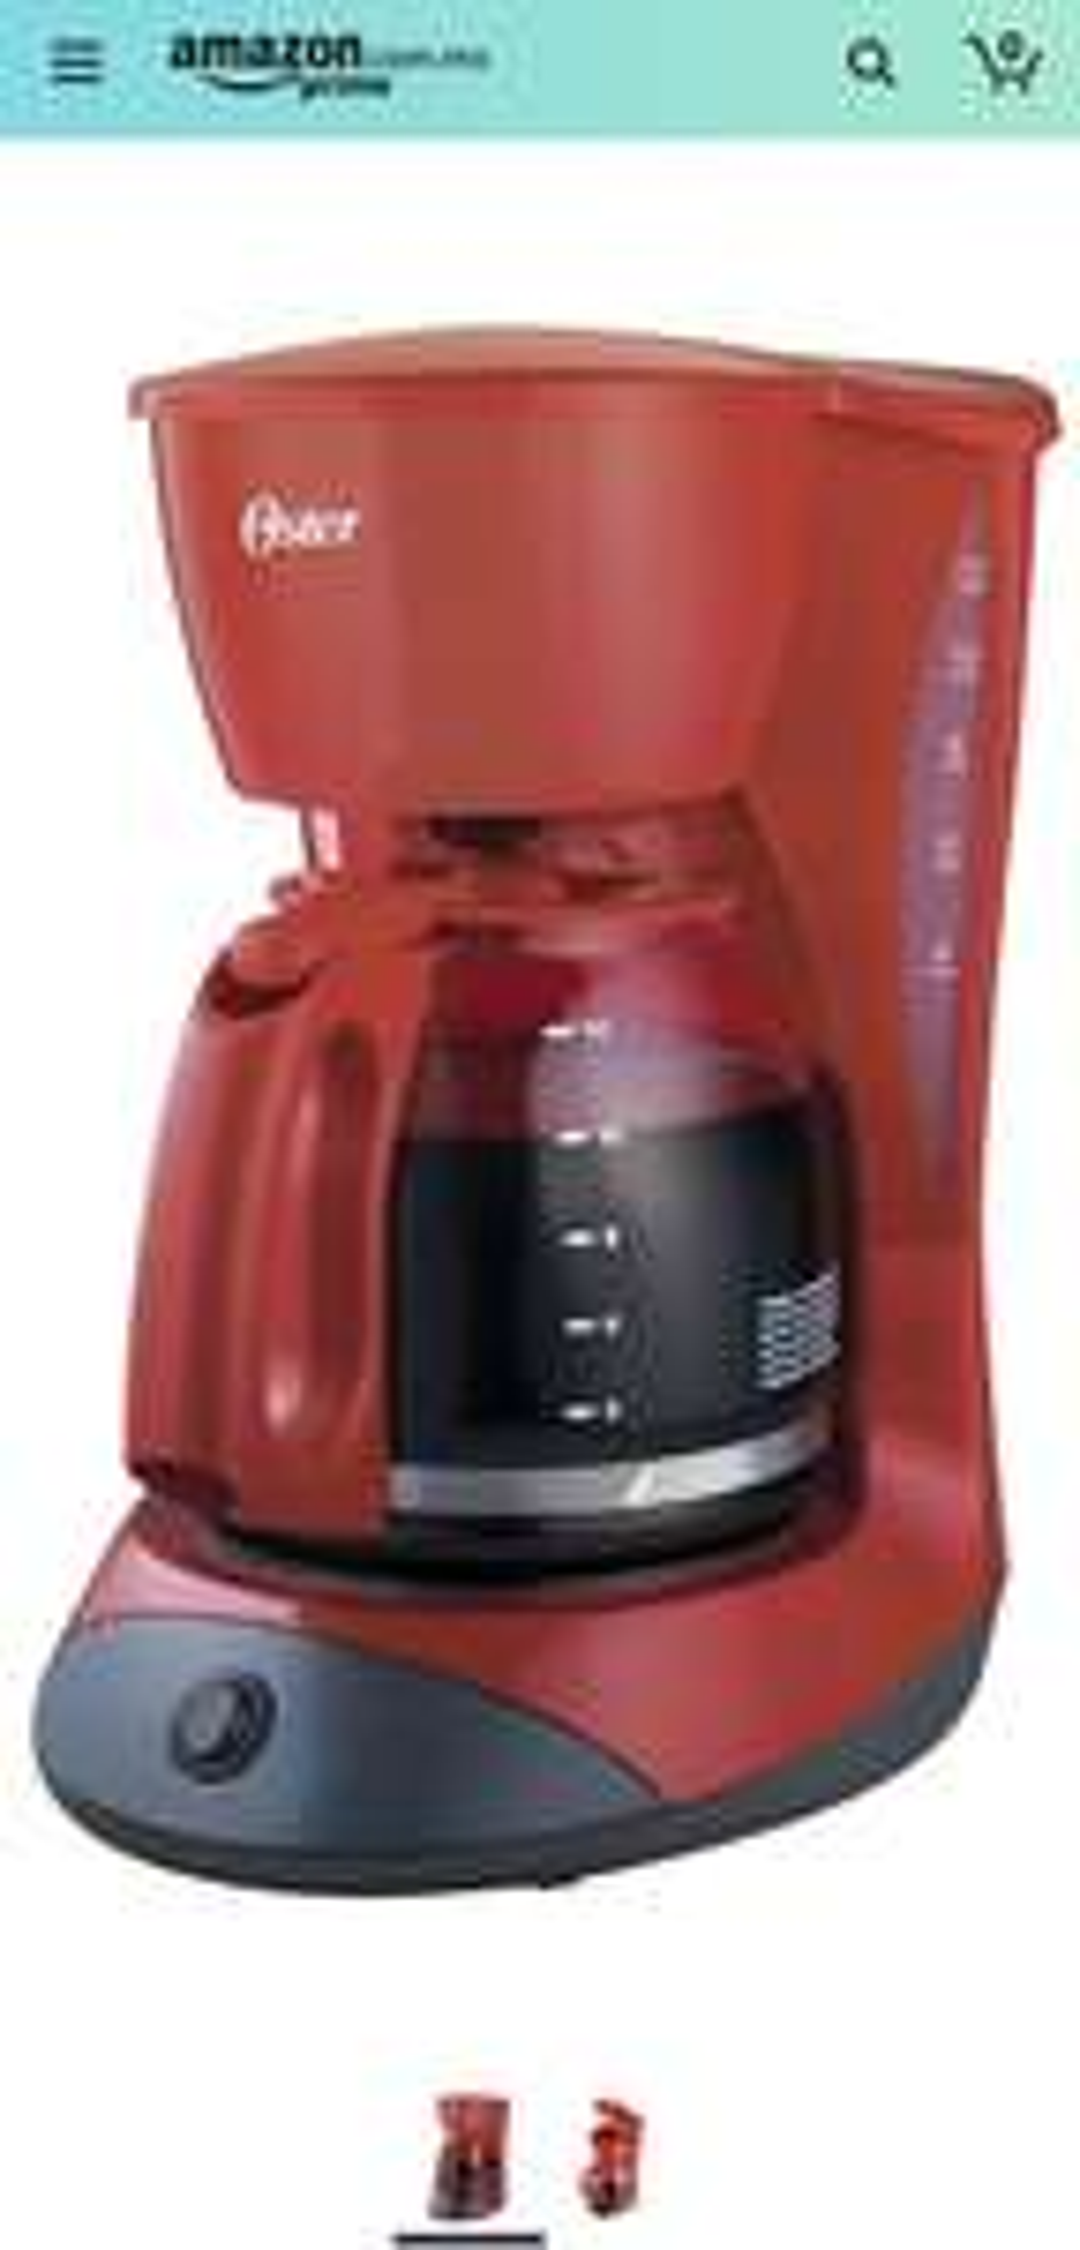 Amazon: Cafetera Oster® roja de 12 tazas con función de pausa y servir